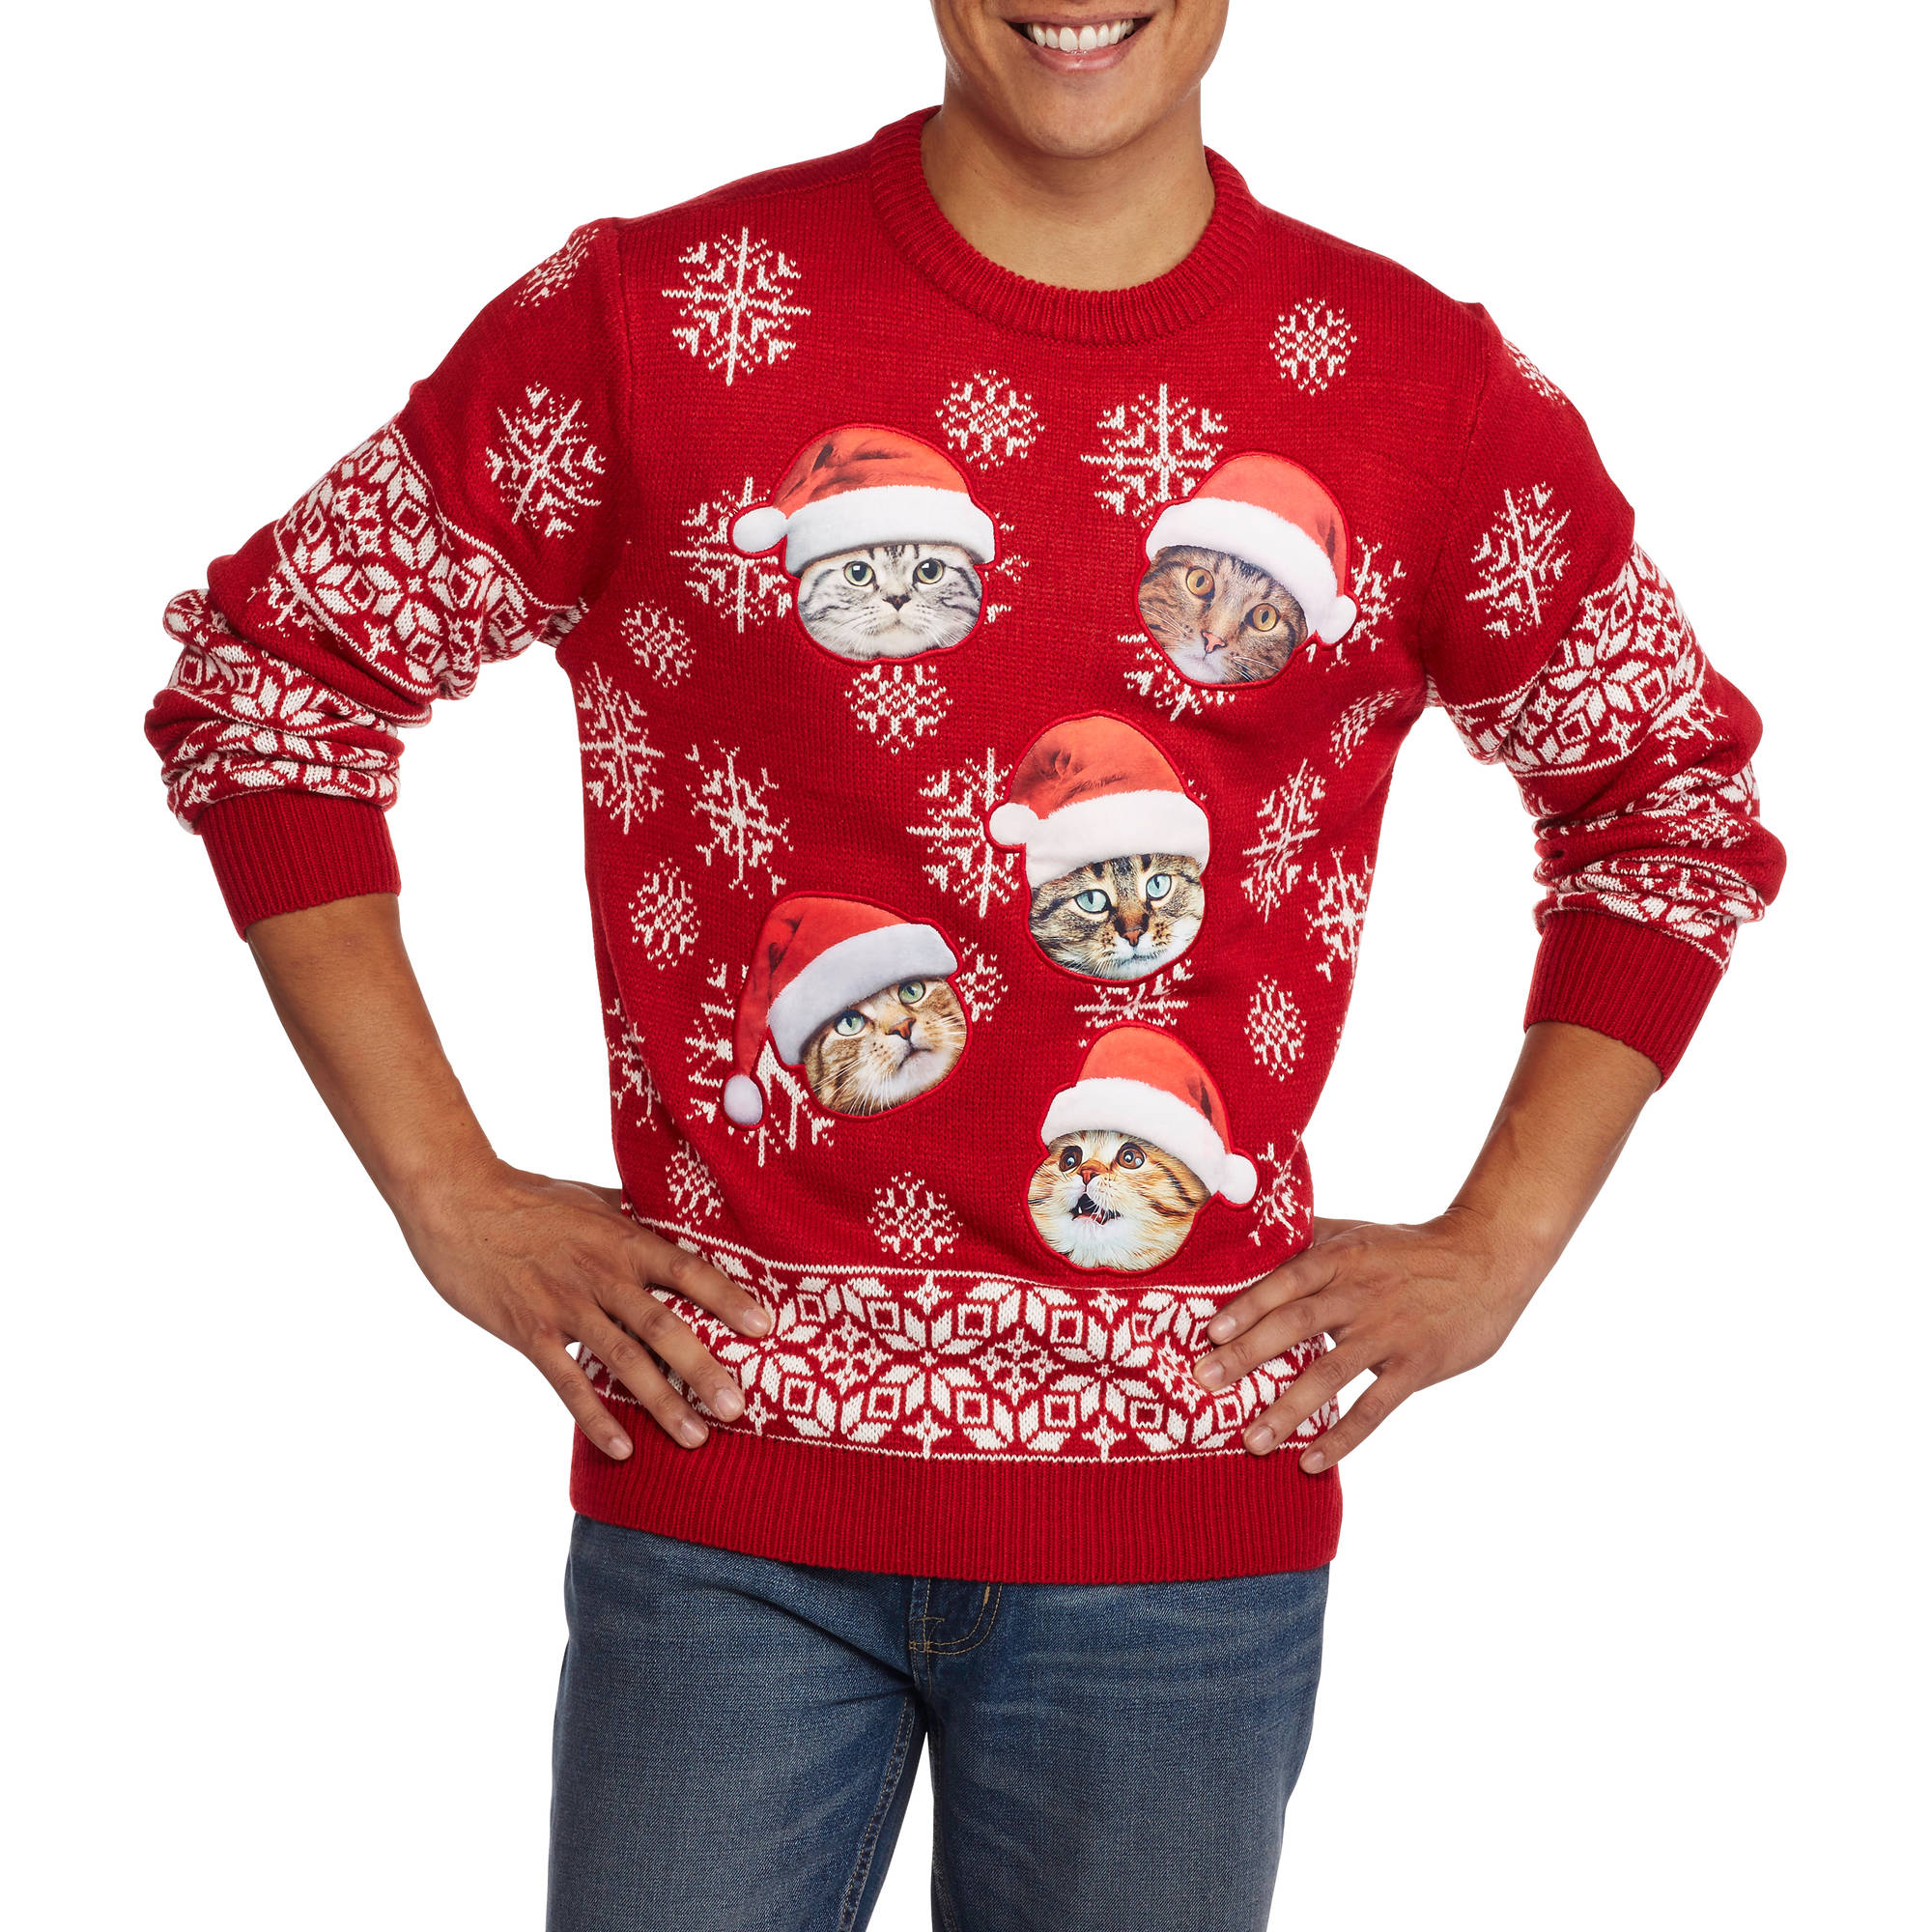 Holiday Christmas Sweater Walmartcom